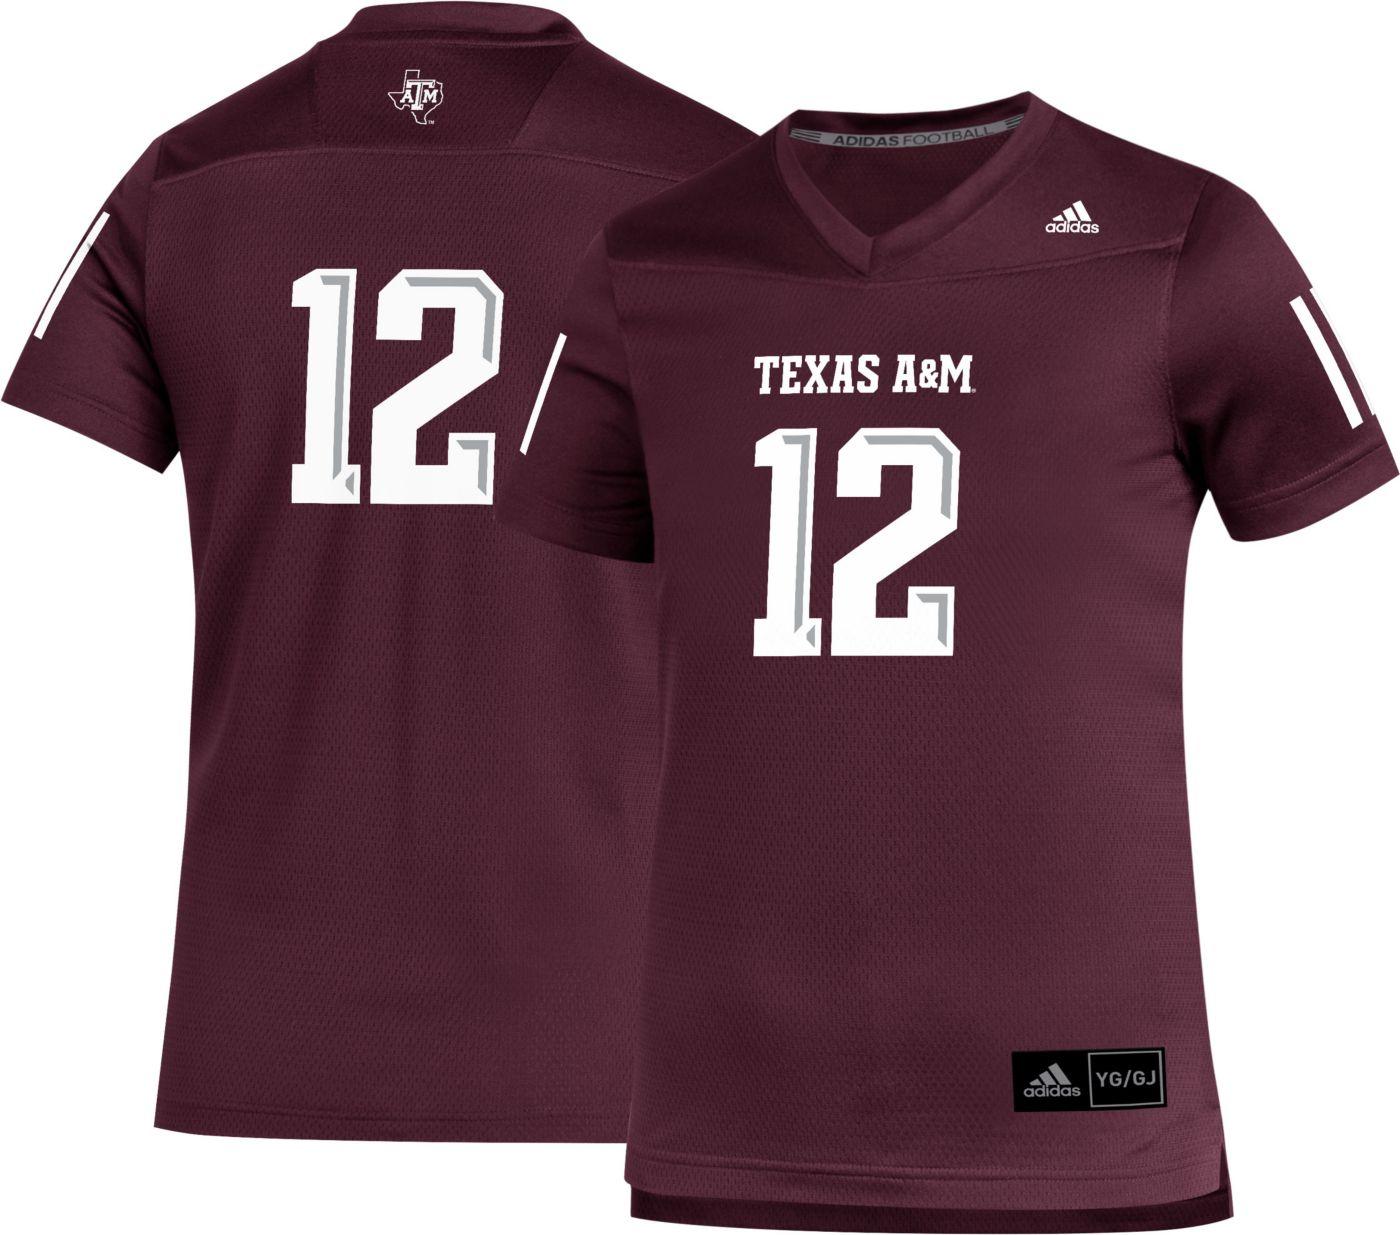 adidas Youth Texas A&M Aggies #12 Maroon Replica Football Jersey